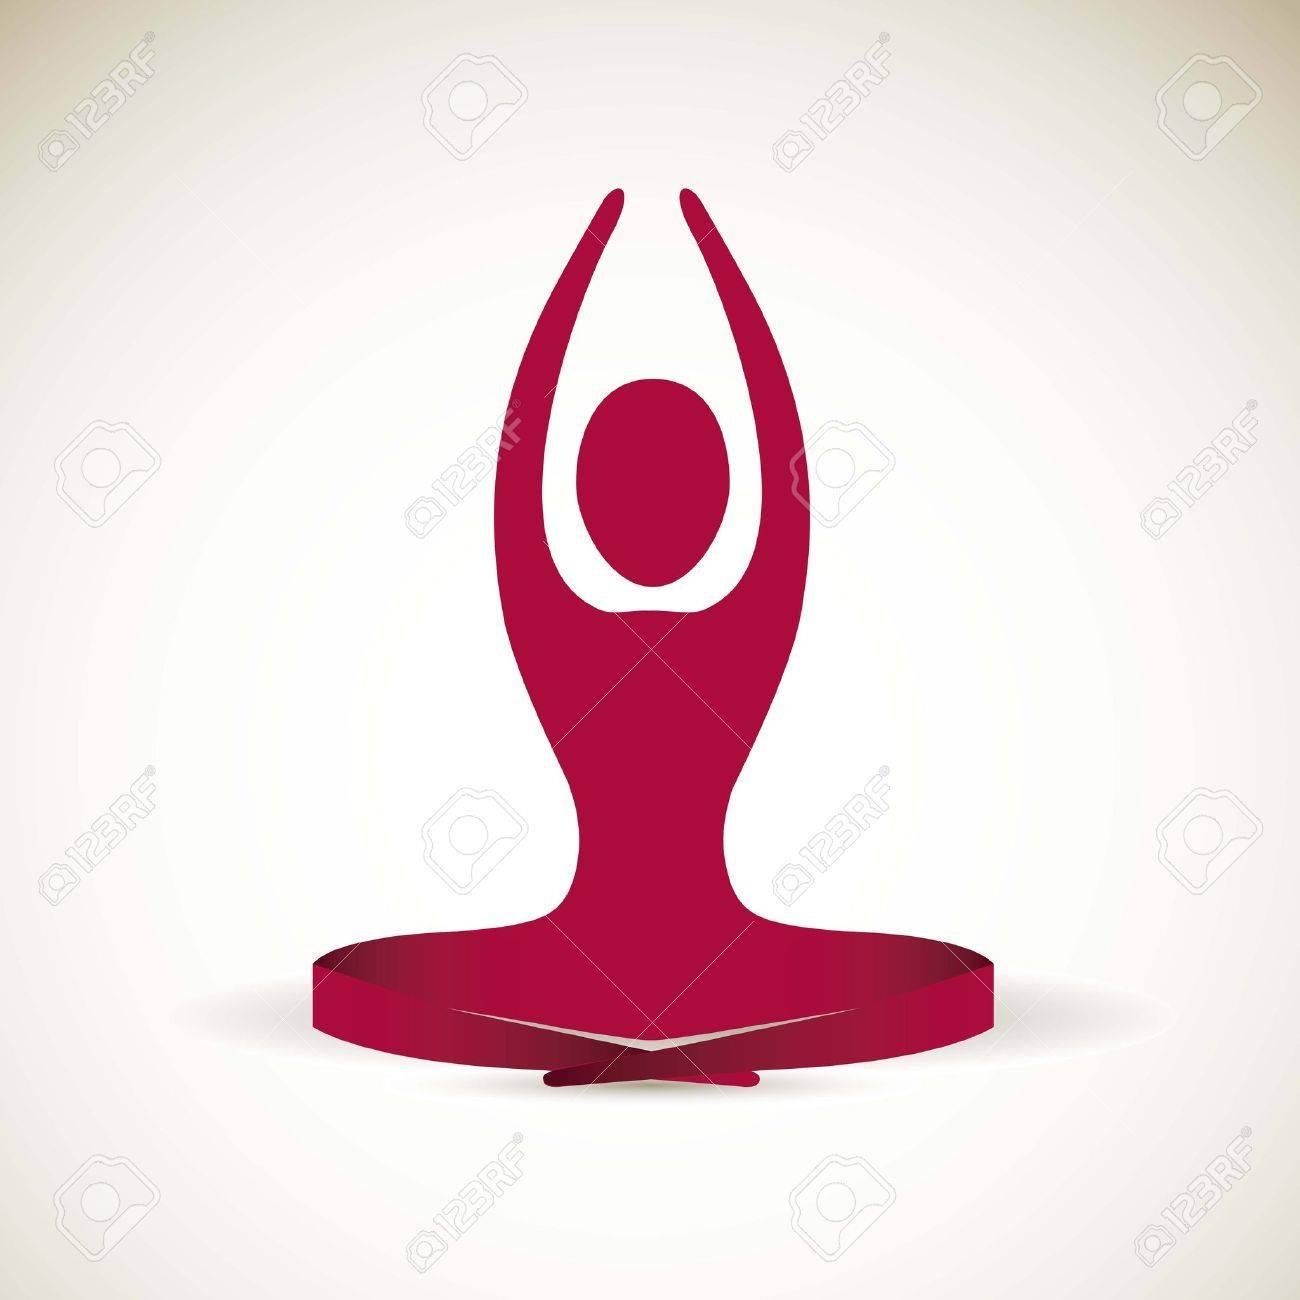 yoga icon : silhouette of man